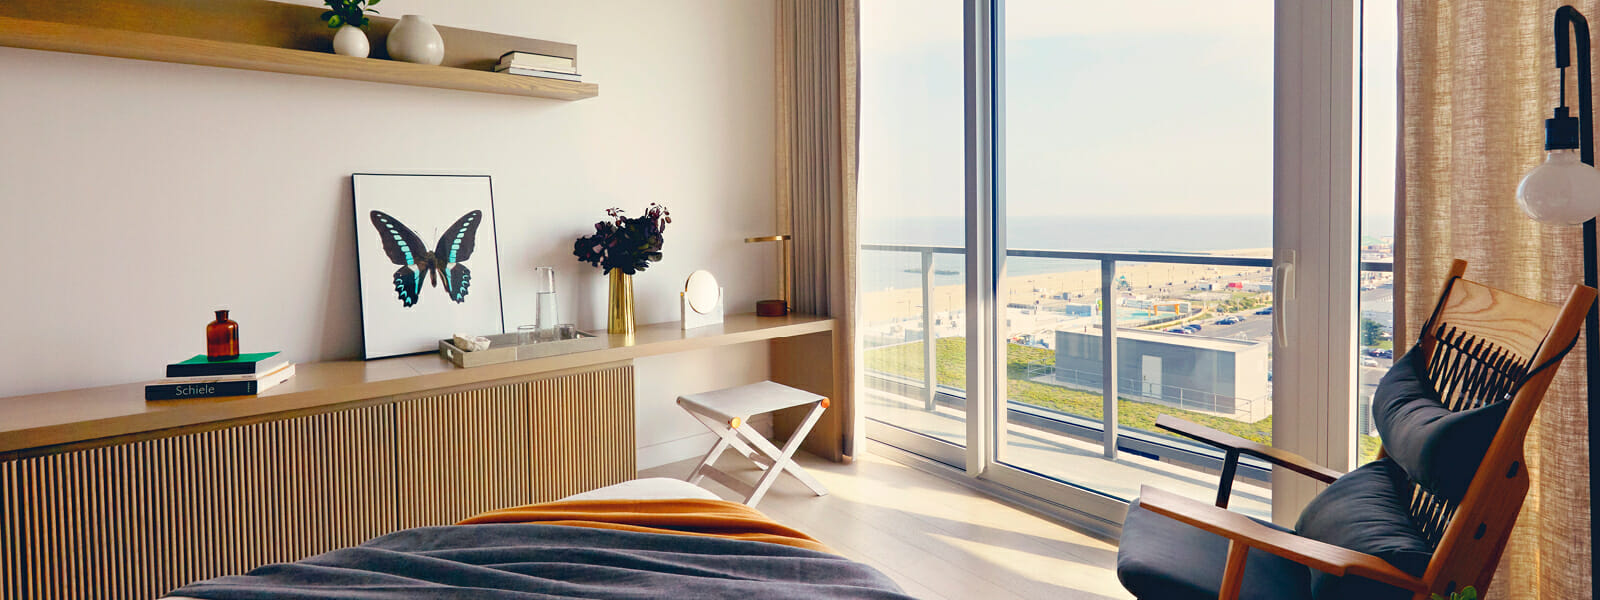 Oceanview Apartments in New Jersey   Asbury Ocean Club   Asbury Park